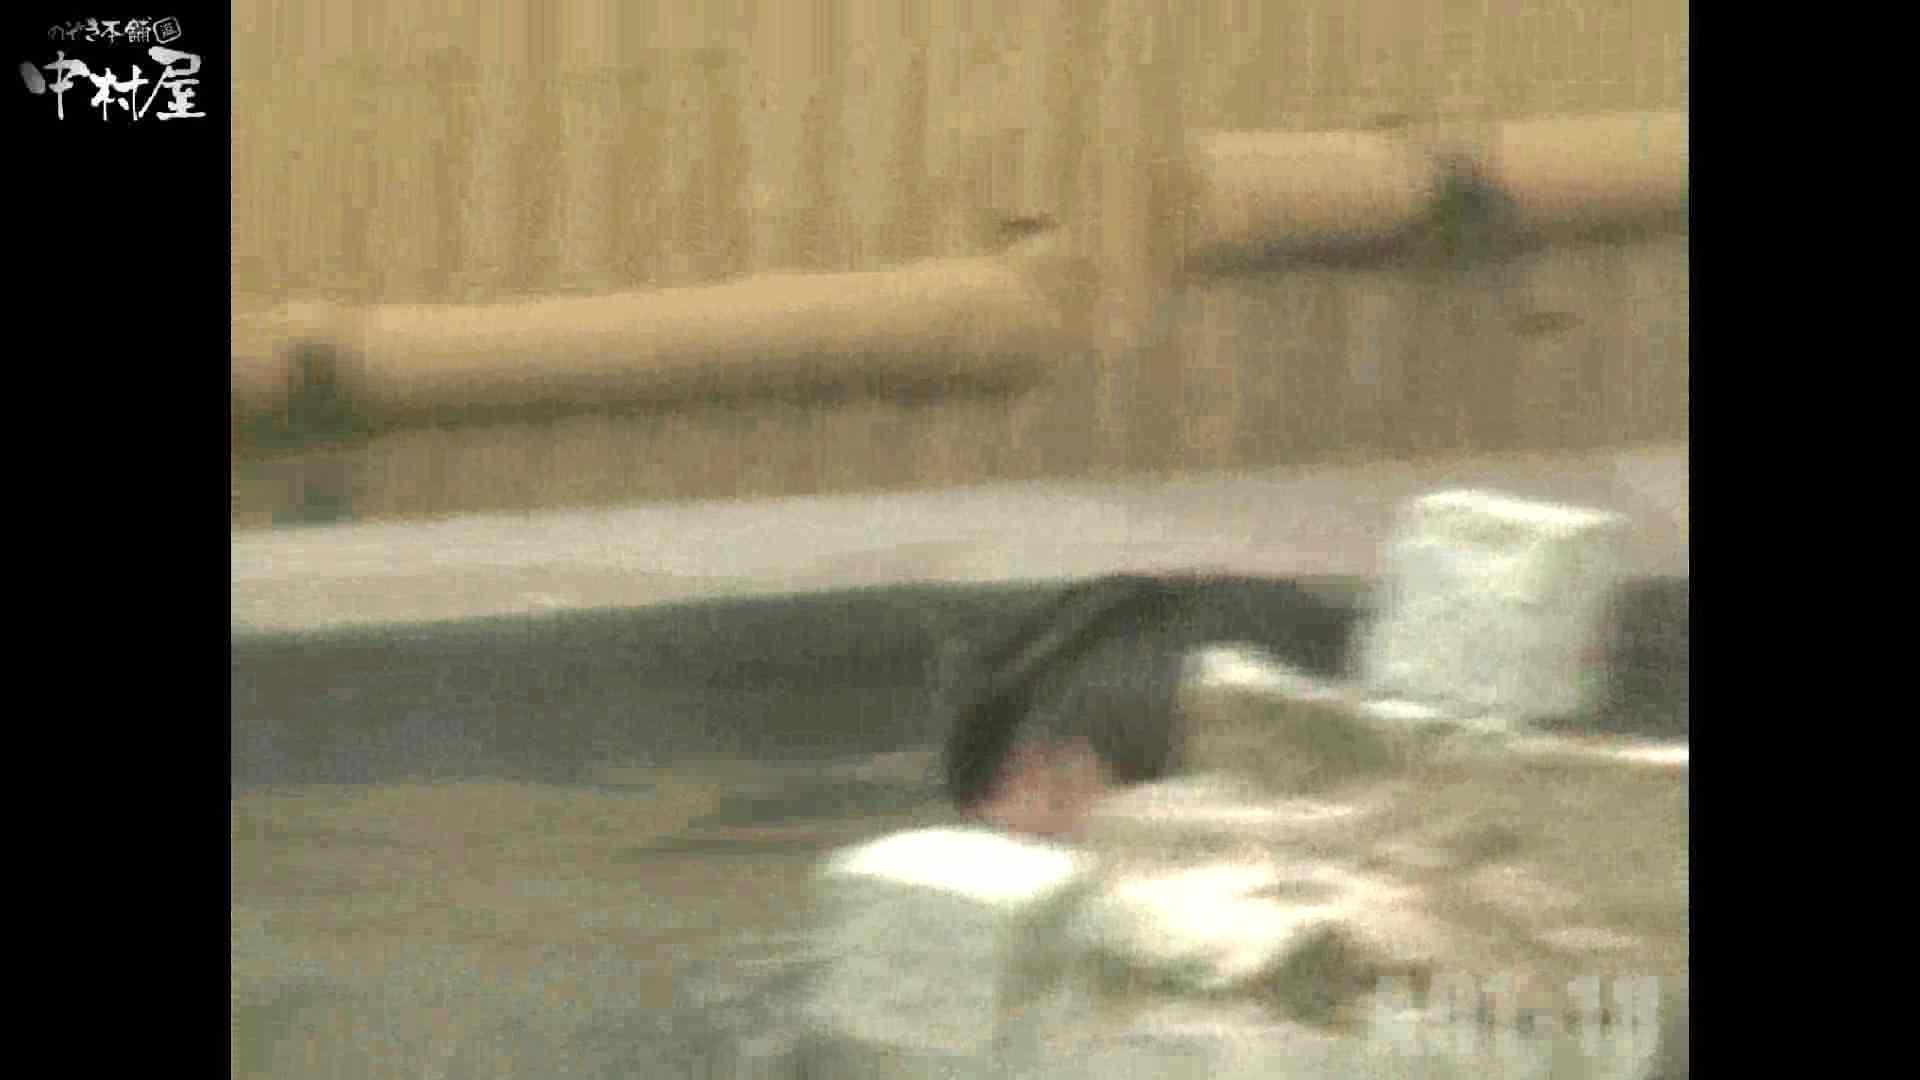 Aquaな露天風呂Vol.882潜入盗撮露天風呂十八判湯 其の七 盗撮 | 潜入  113連発 49